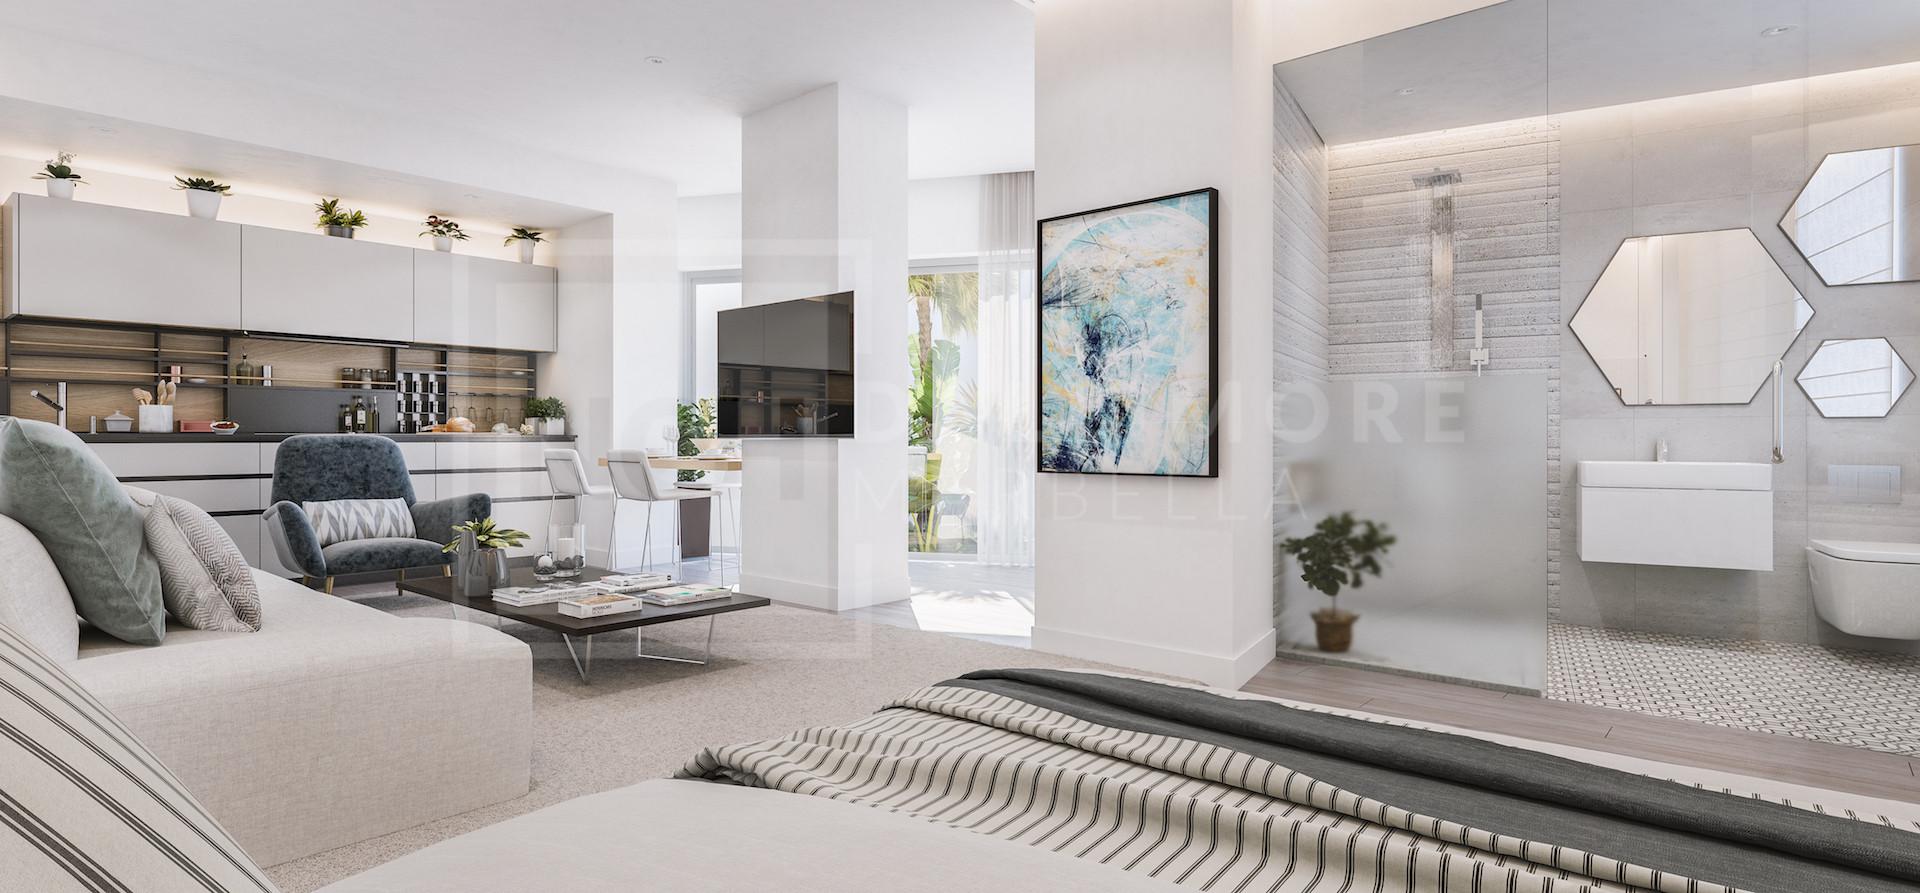 Apartment Centro Histórico, Malaga - NEWA6298